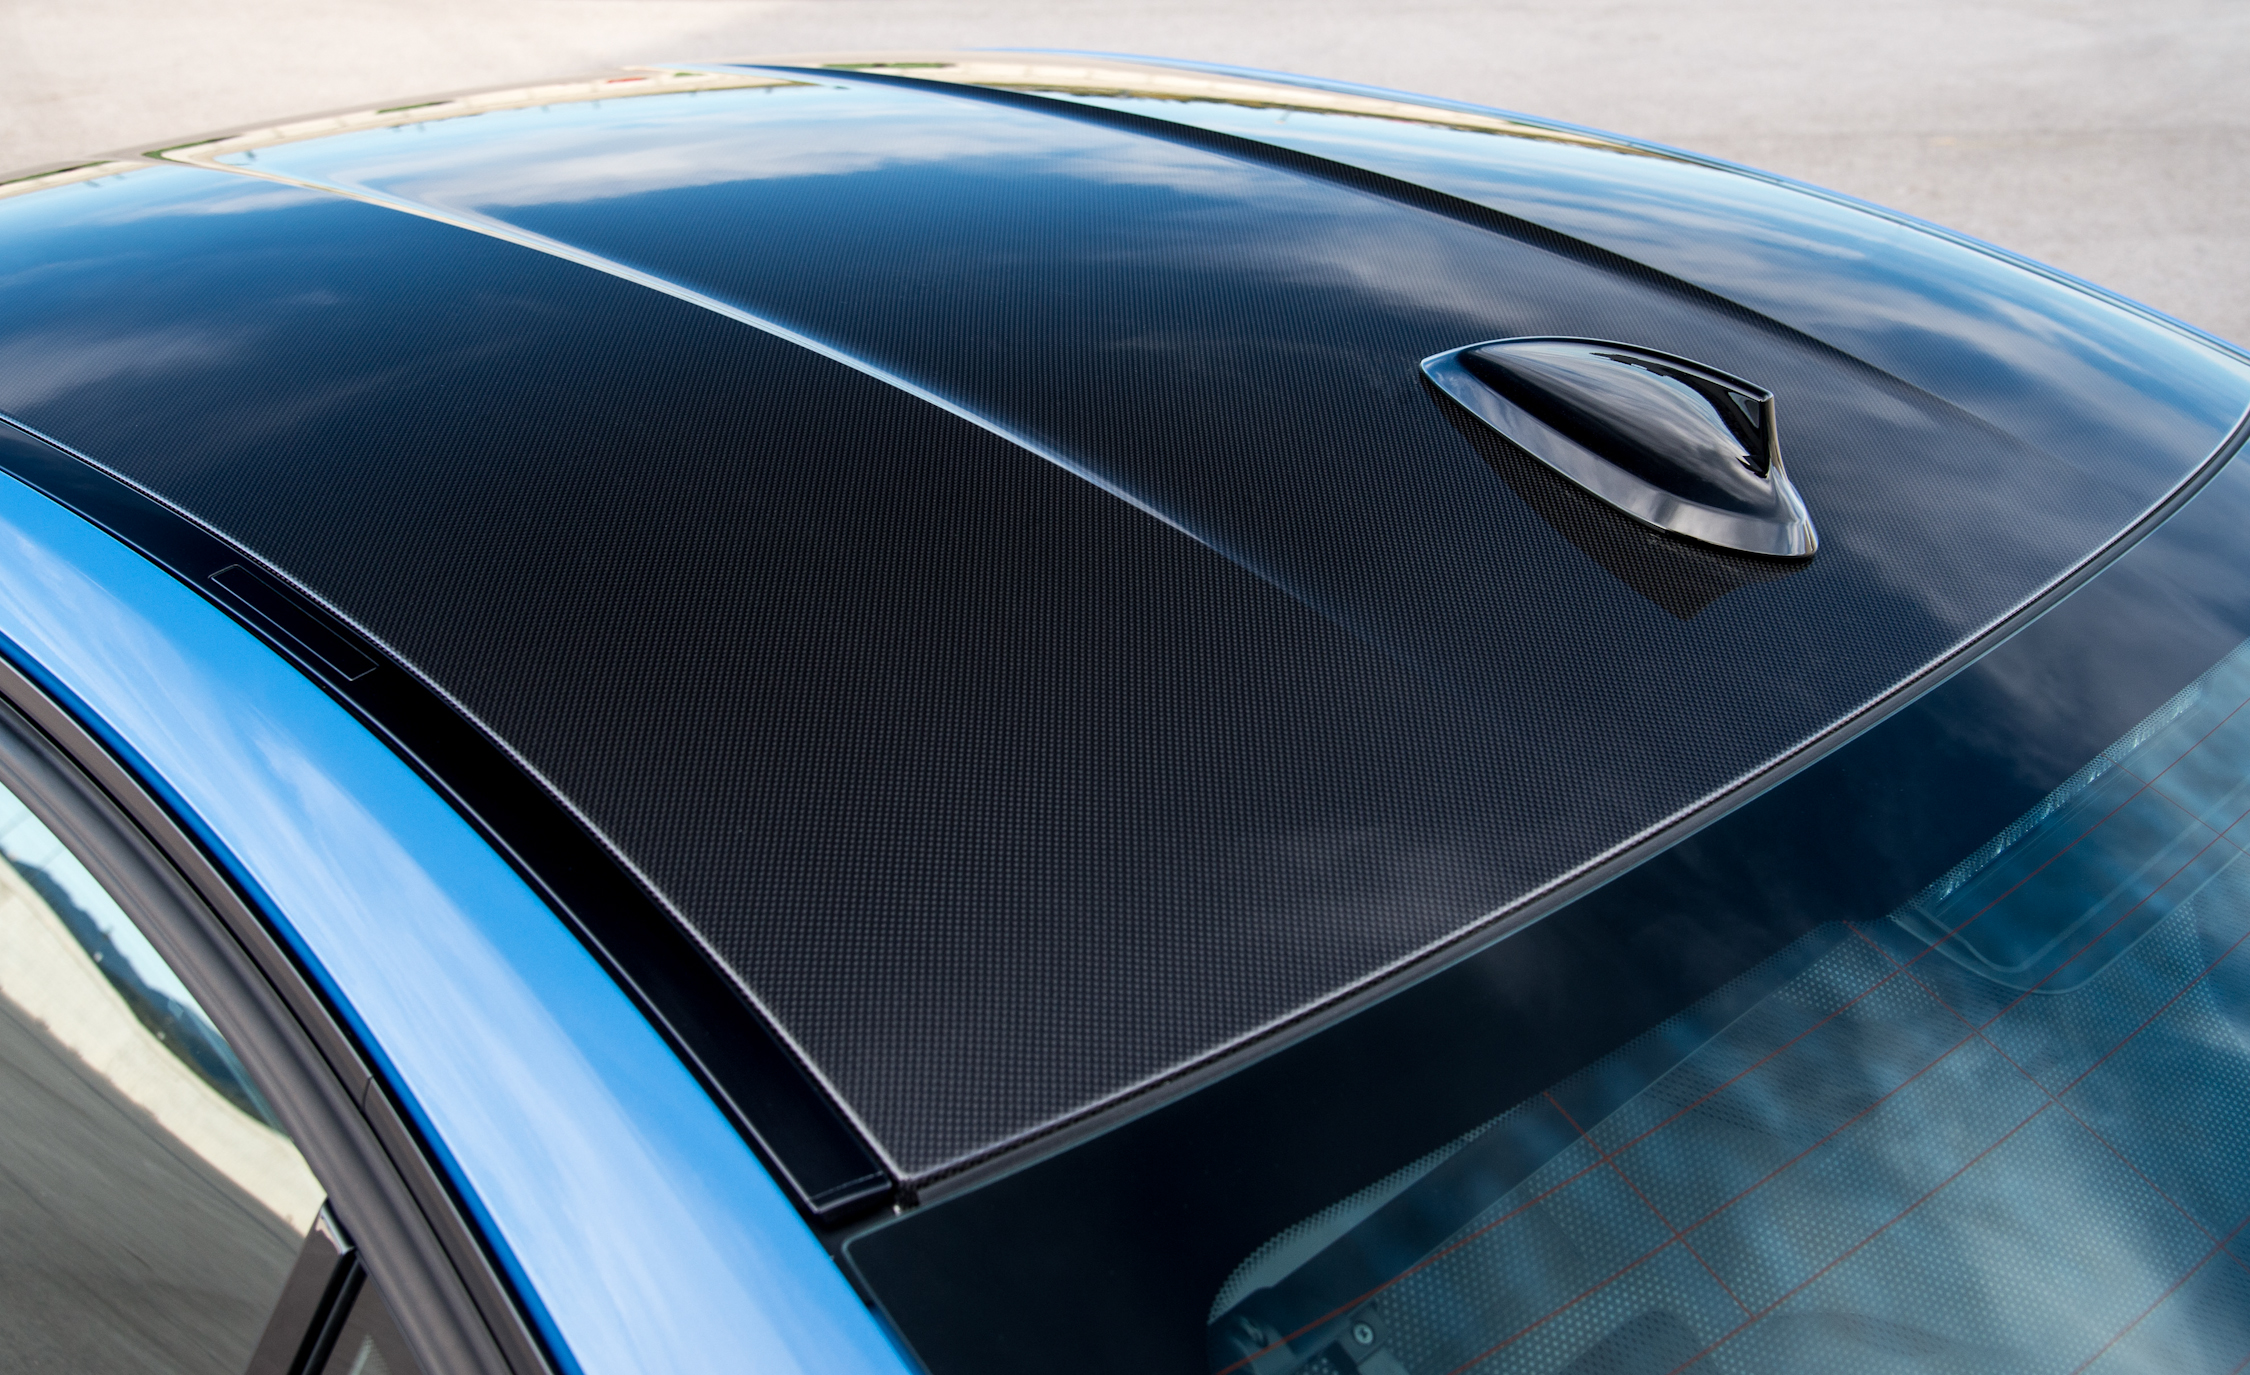 2015 BMW M3 Exterior Carbon Fiber Roof